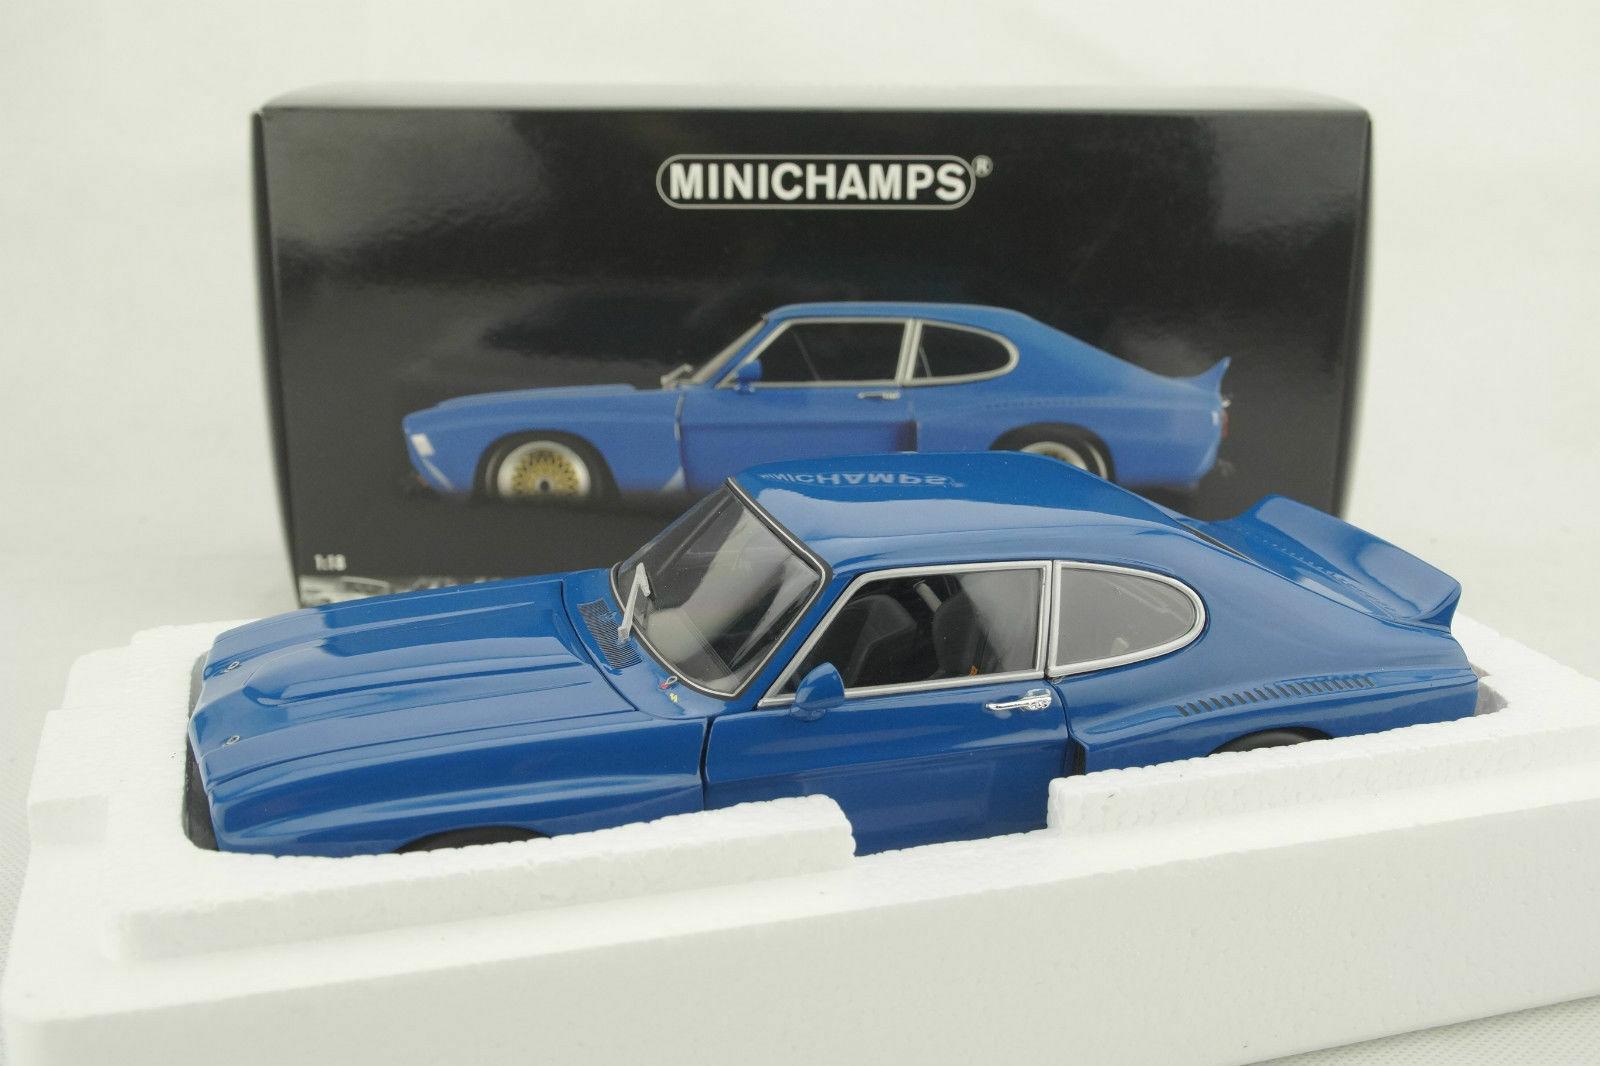 1 18 Minichamps Ford Capri RS 3100 1974 bluee-NEW OVP